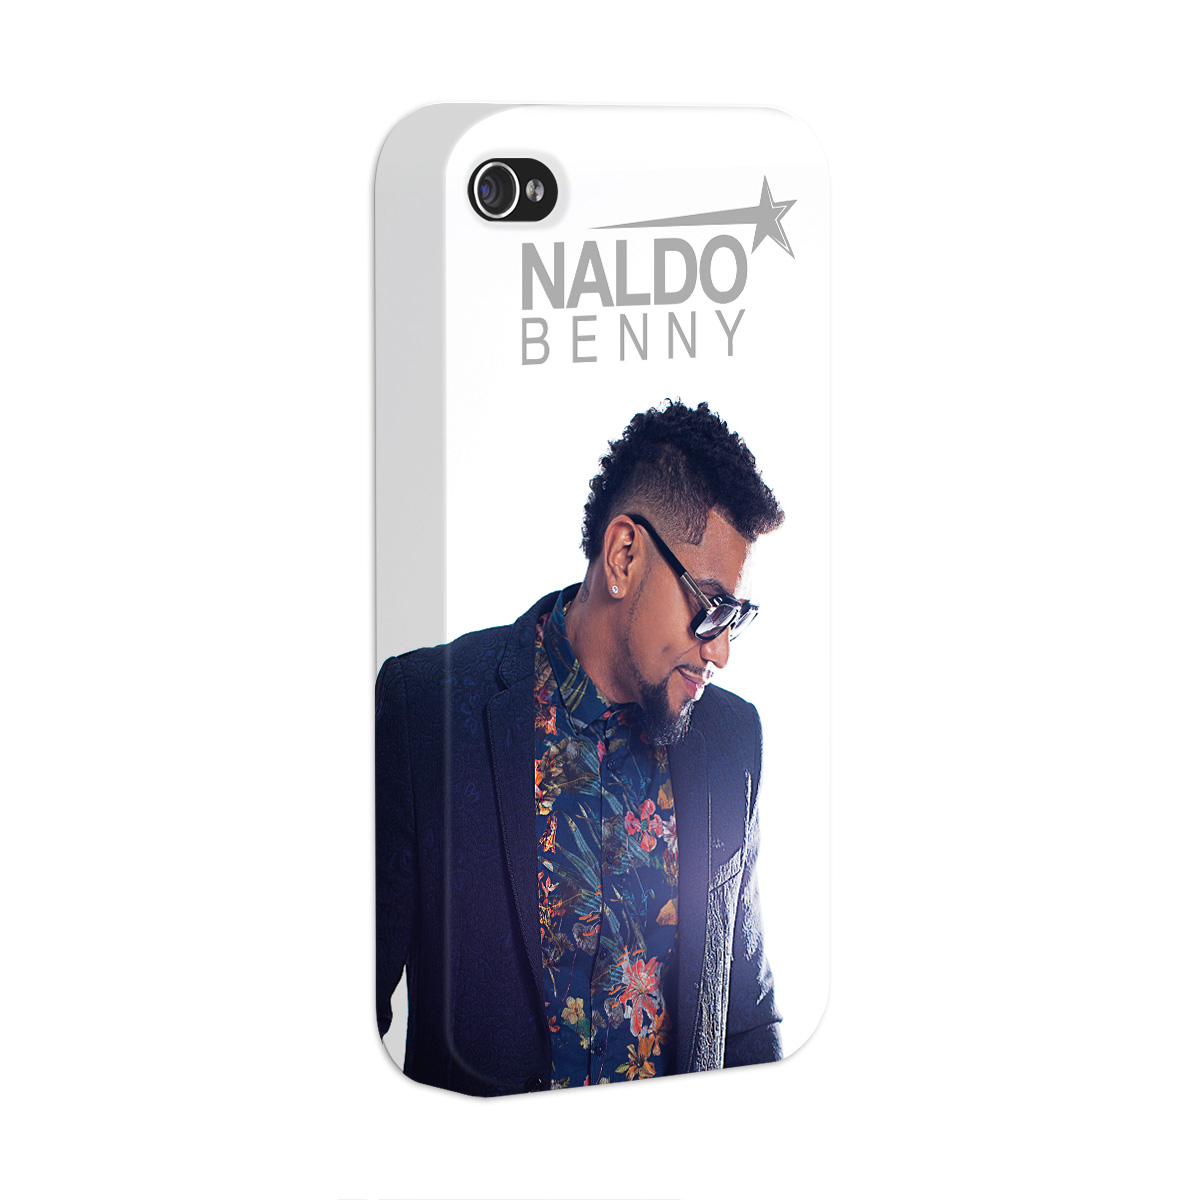 Capa para iPhone 4/4S Naldo Benny Photo